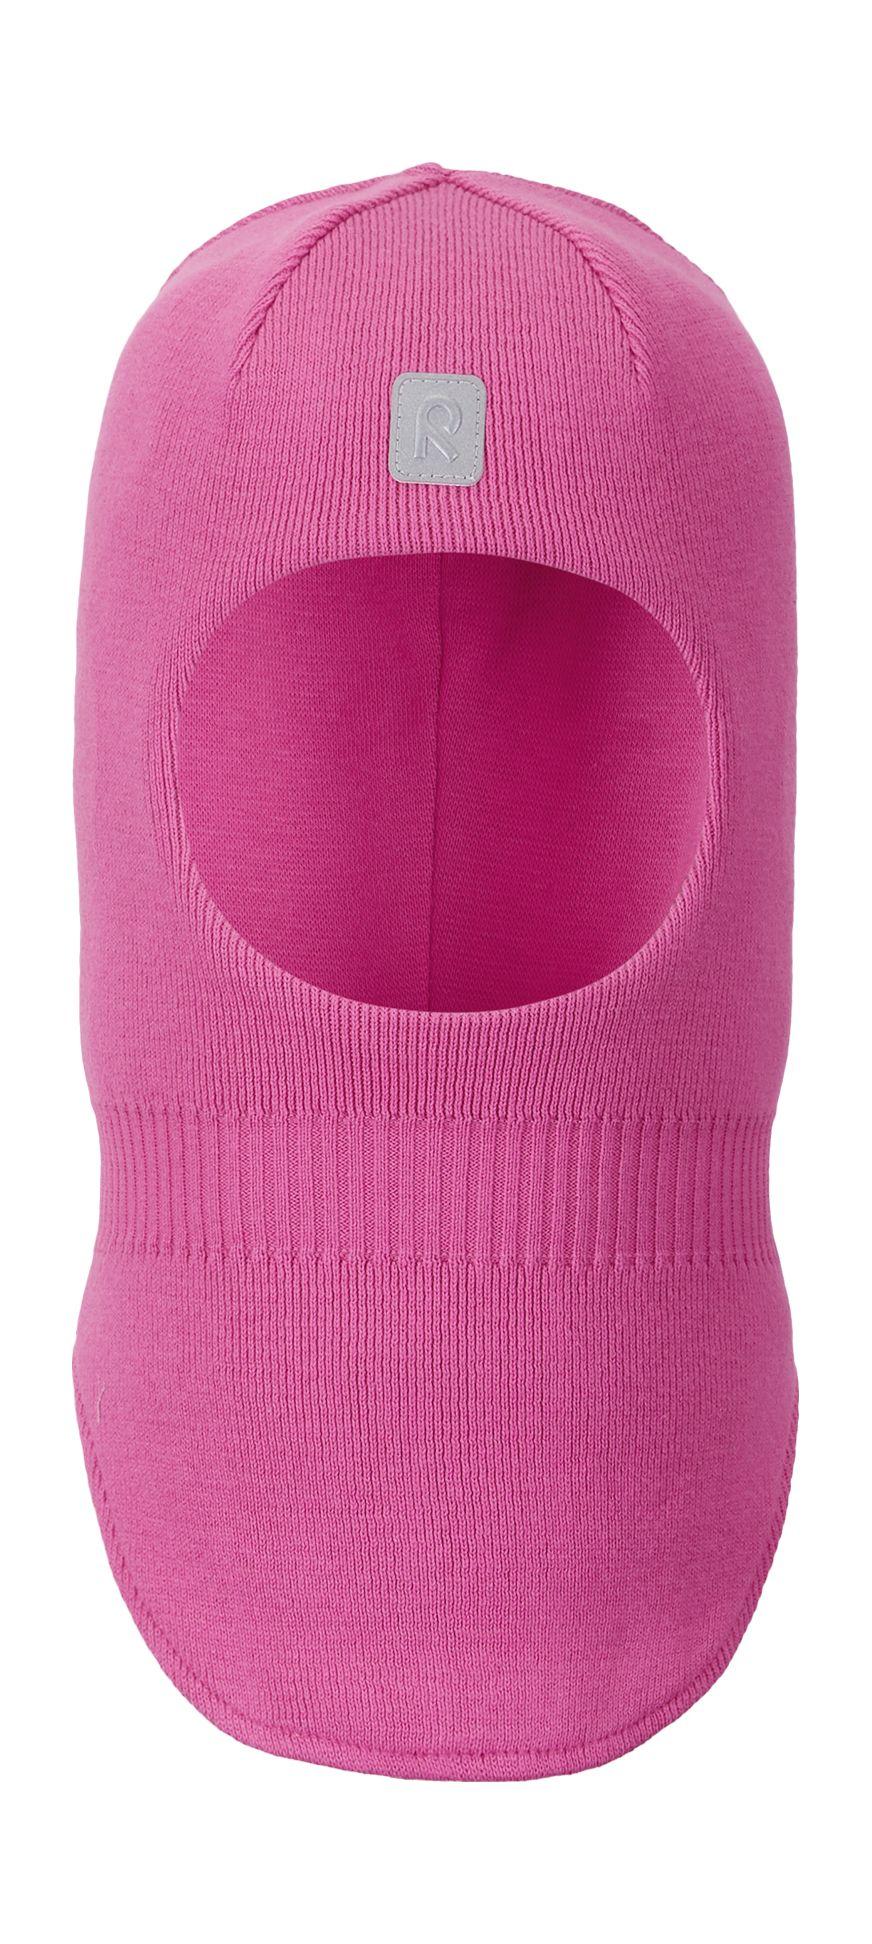 REIMA Honka 518581 Fuchsia Pink 48